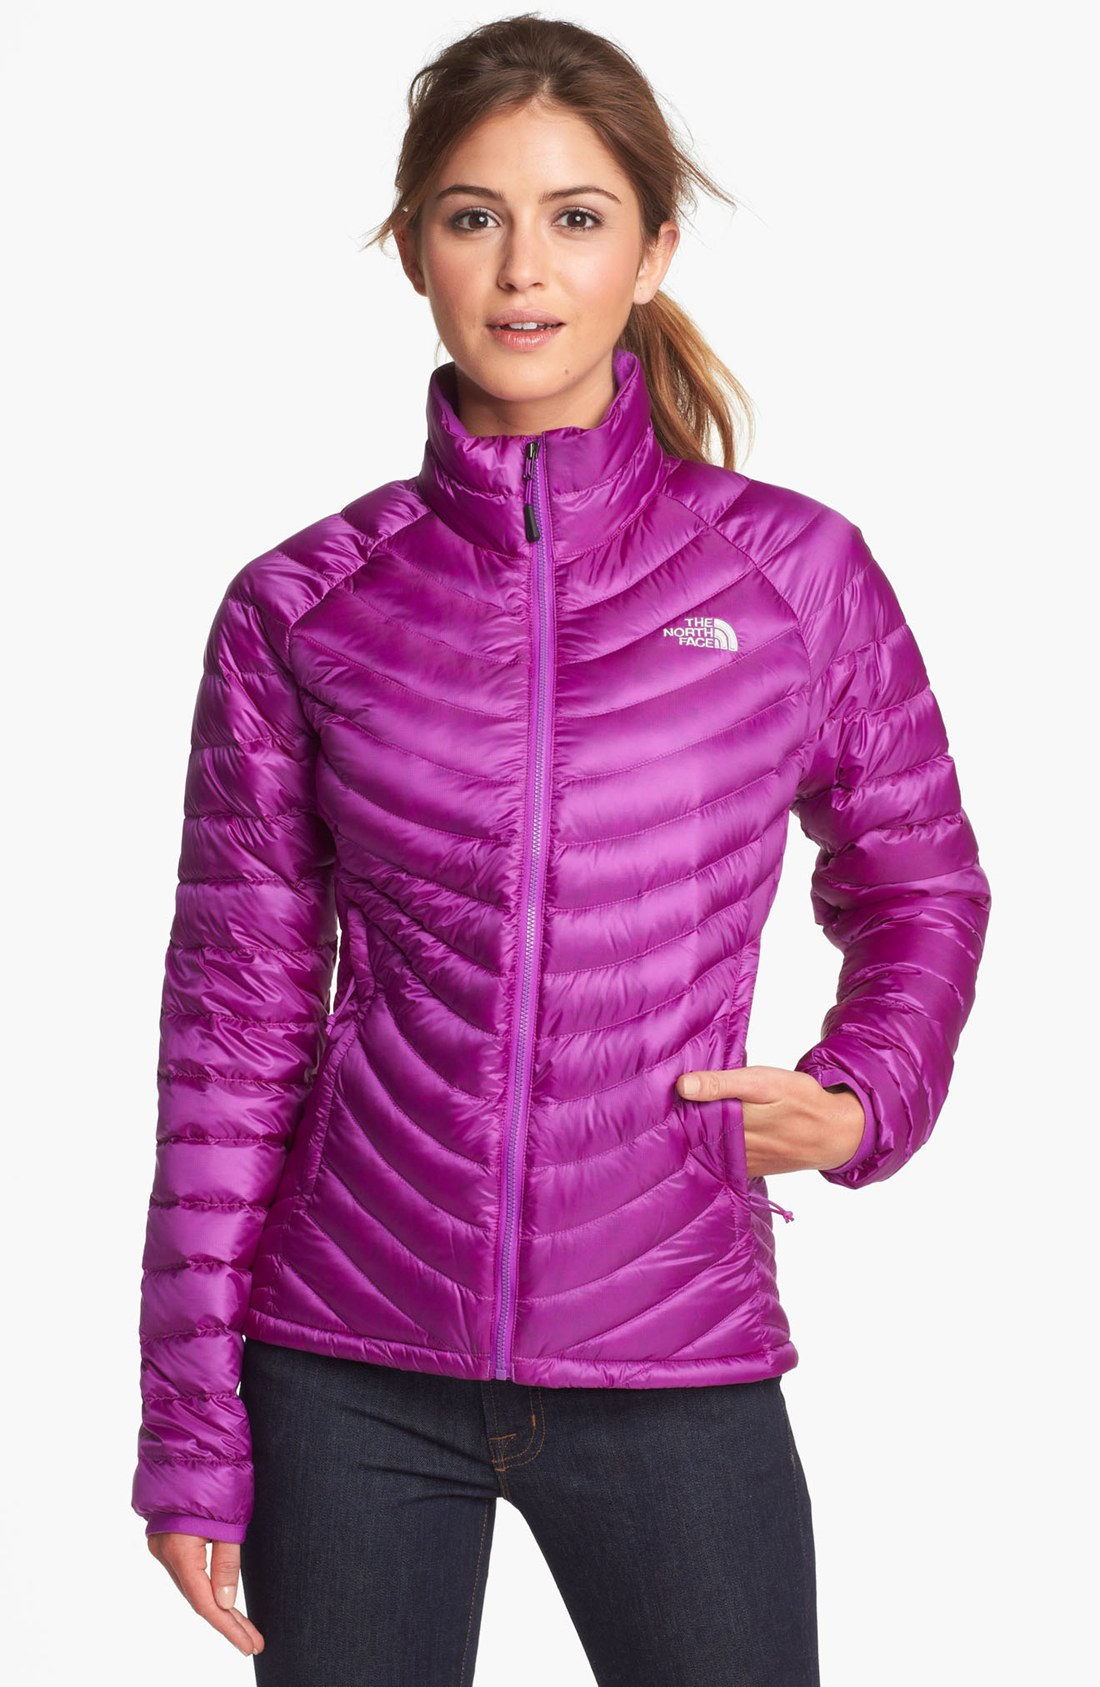 24851c4e5 sale north face purple puffer jacket 2e5e3 3f788